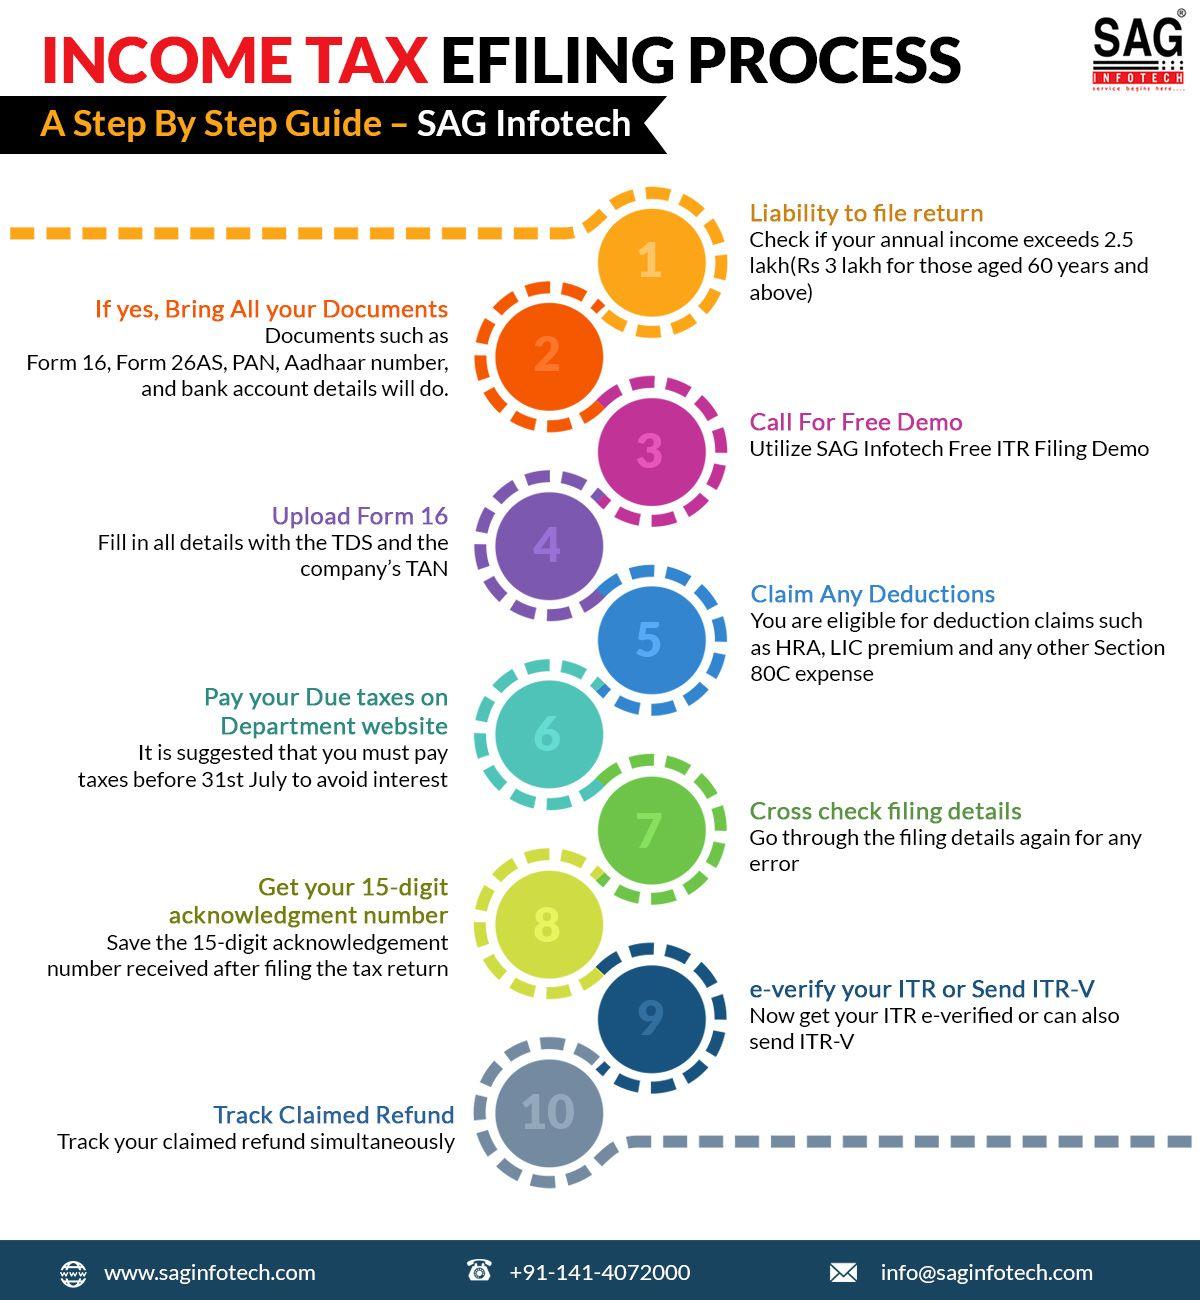 How to File ITR 1 Sahaj Form Online for AY 202021 (Easily